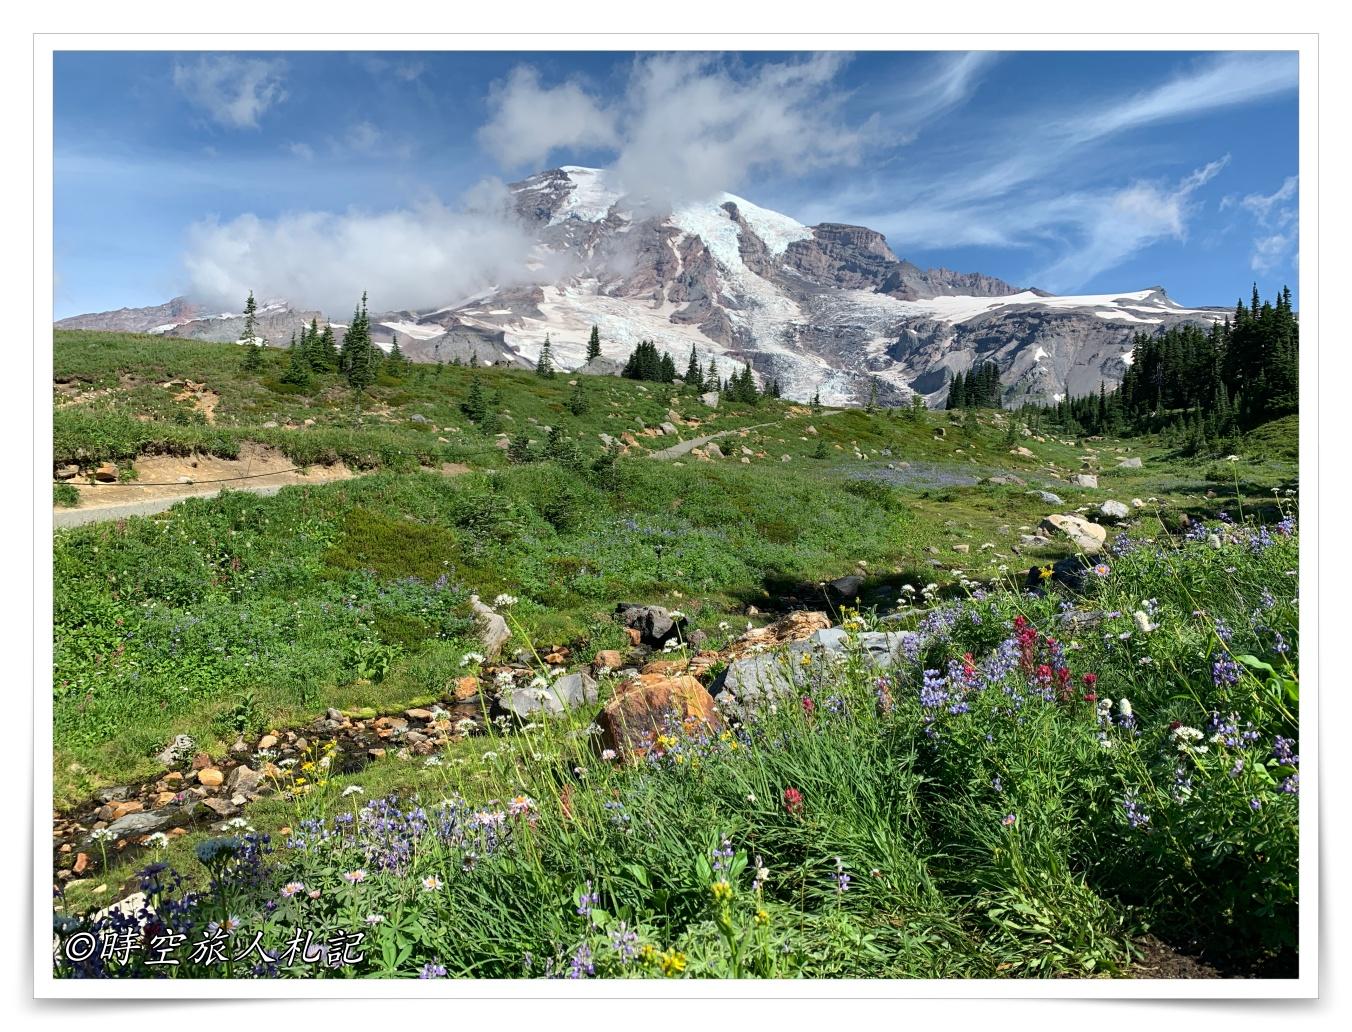 雷尼爾山國家公園Mt Rainier National Park 3日遊 Day 2: Skyline trail登山記